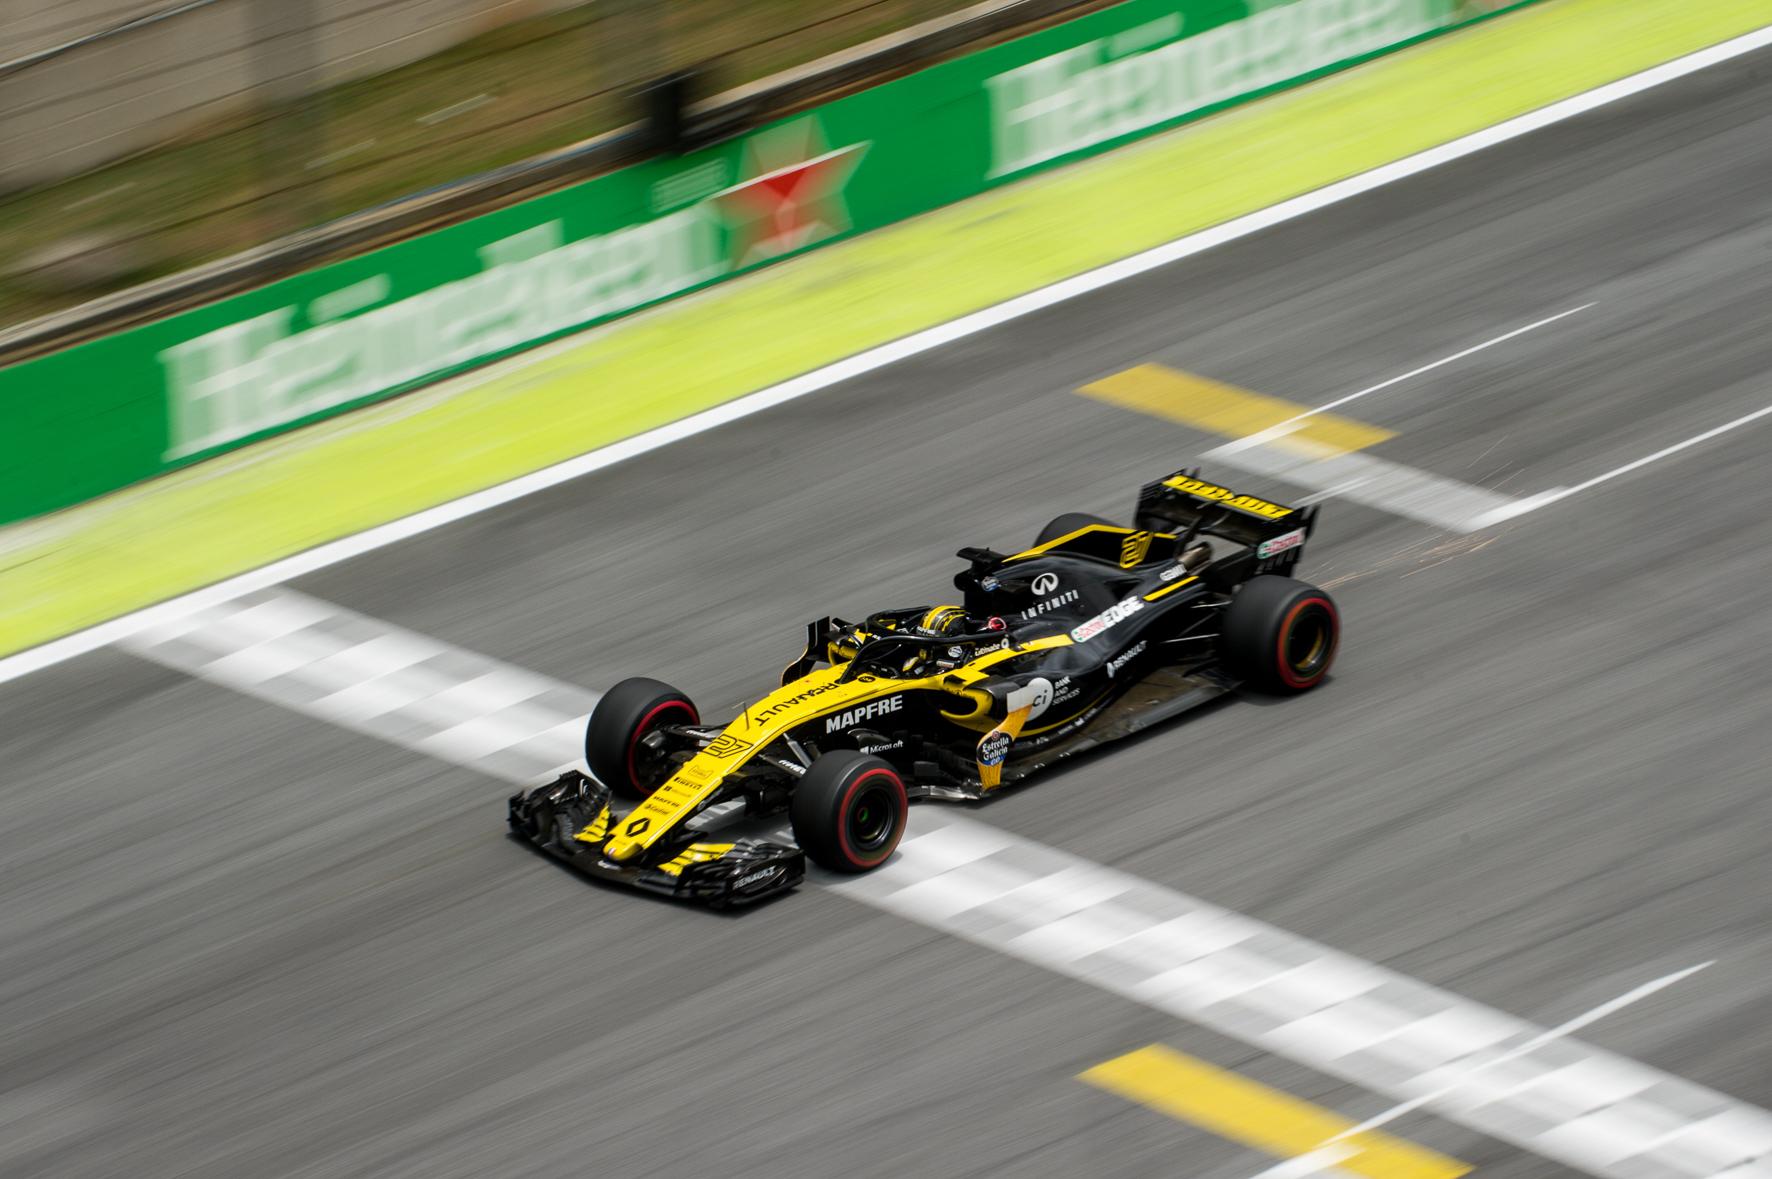 GPBrasil2018_dudabairros_Renault-31245